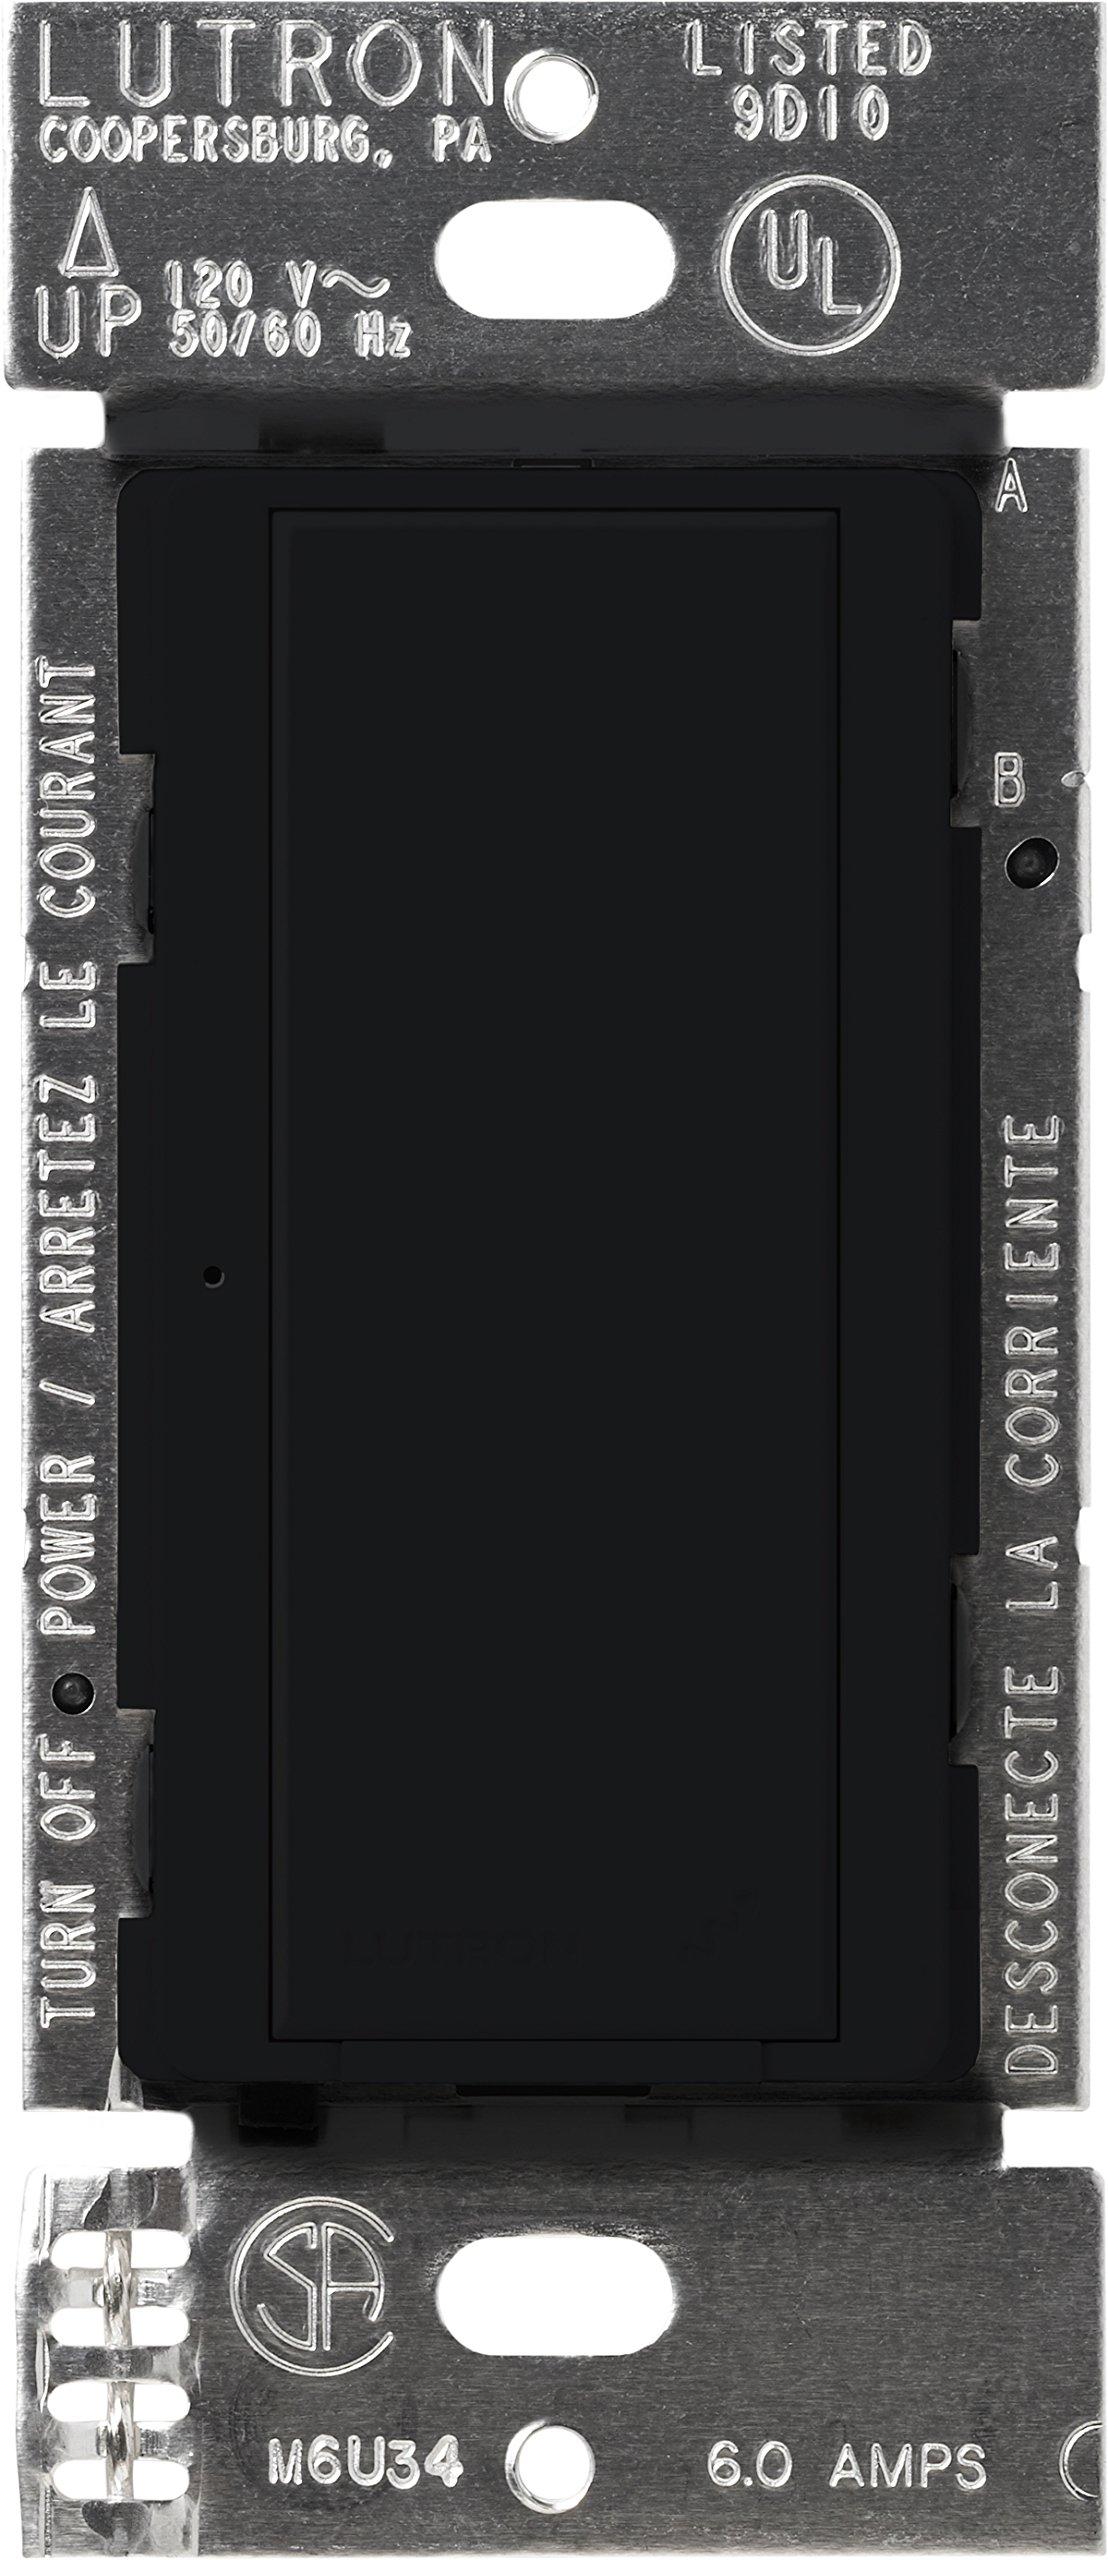 Lutron MRF2-6ANS-BL Maestro Wireless 6 Amp Multi-location Switch, Black